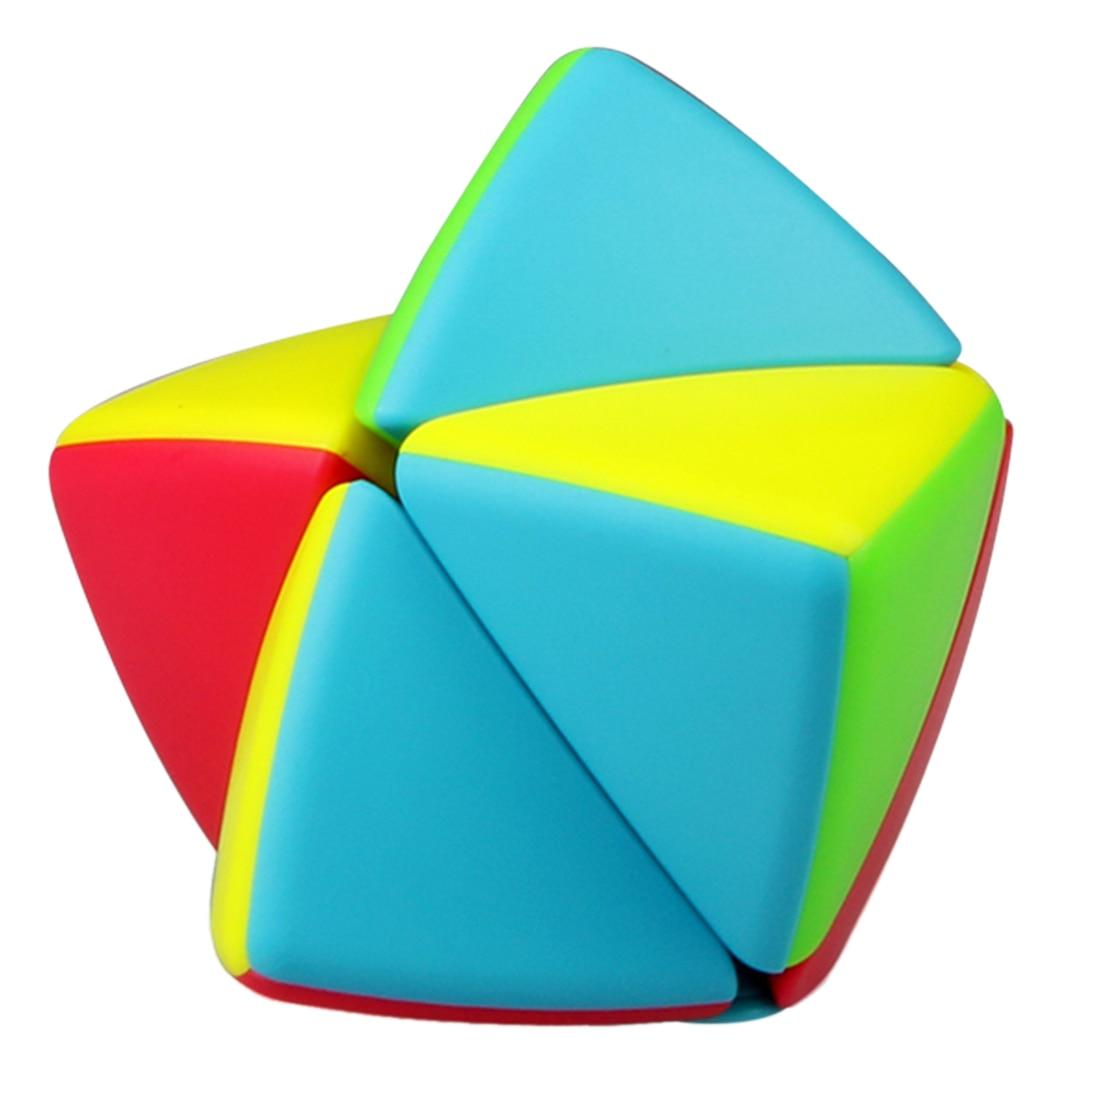 Qiyi 2x2 Mastermorphix Magic Cube Educational Toys For Brain Training - Colorful